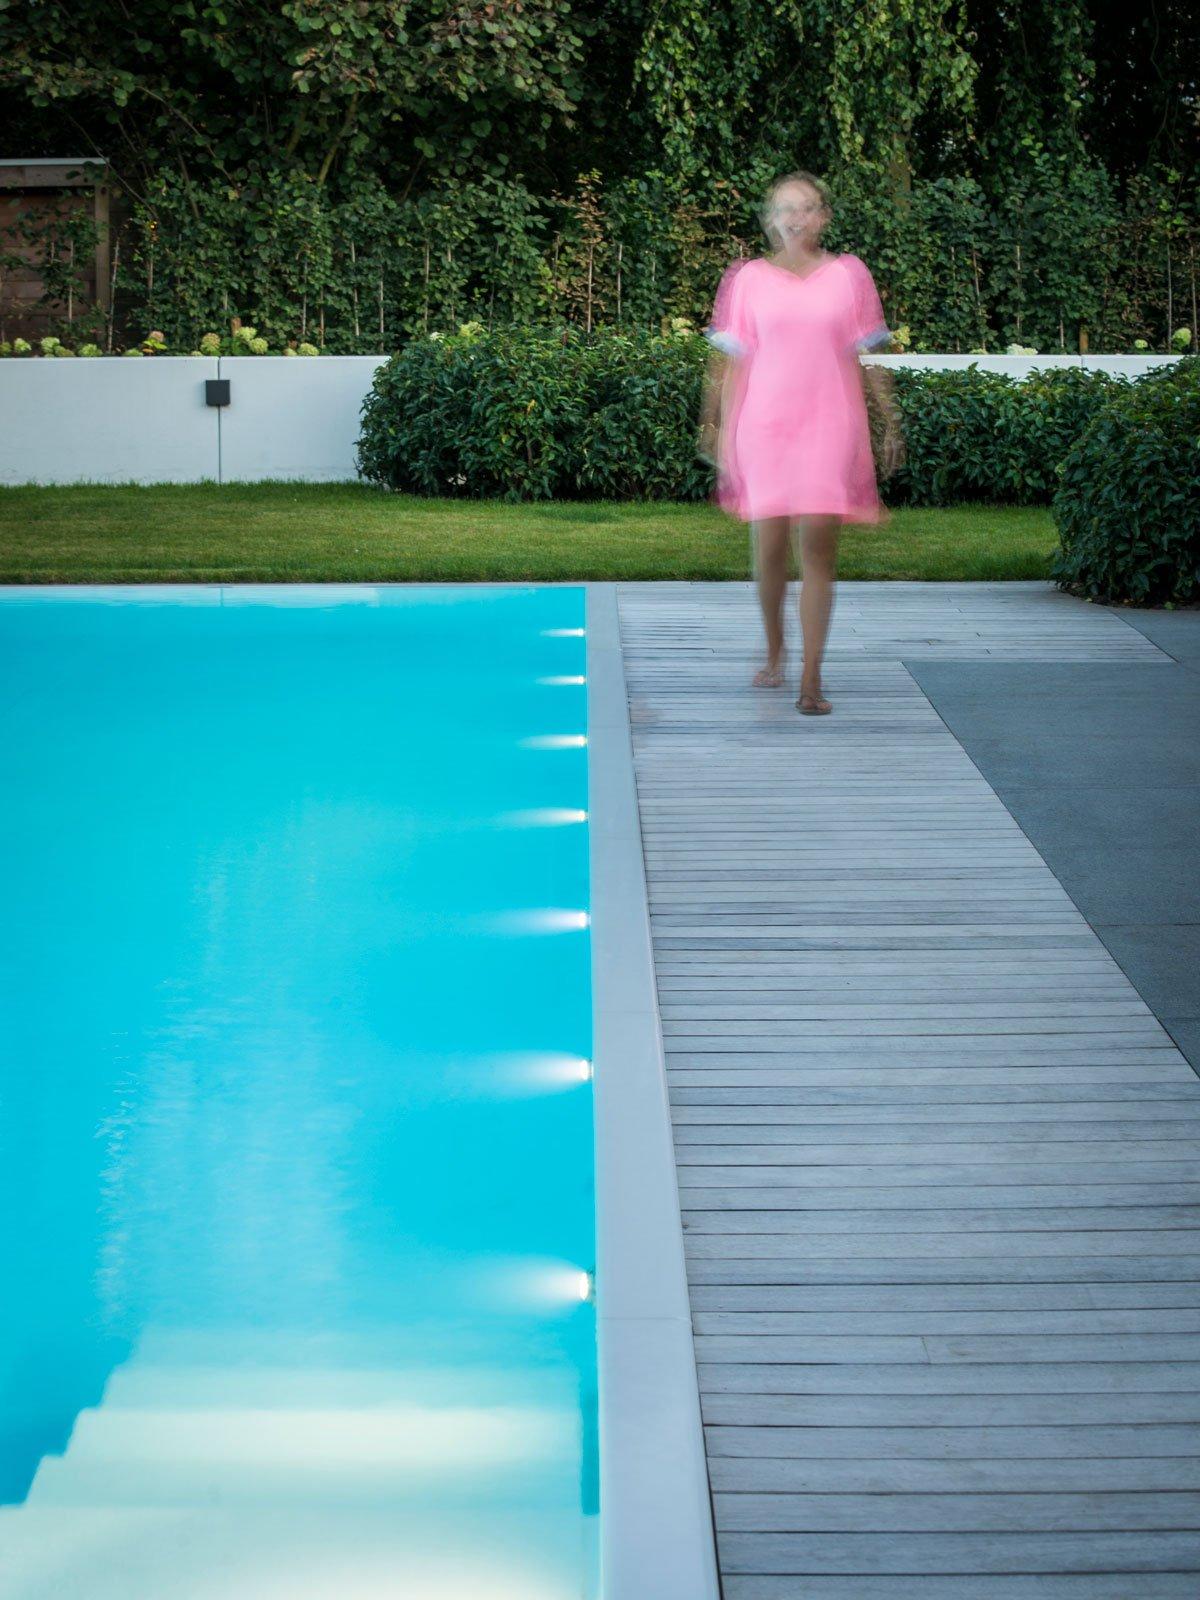 zwembad tuin, 't groene plan, the art of living, tuinaanleg, zwembad, poolhouse, loungeset